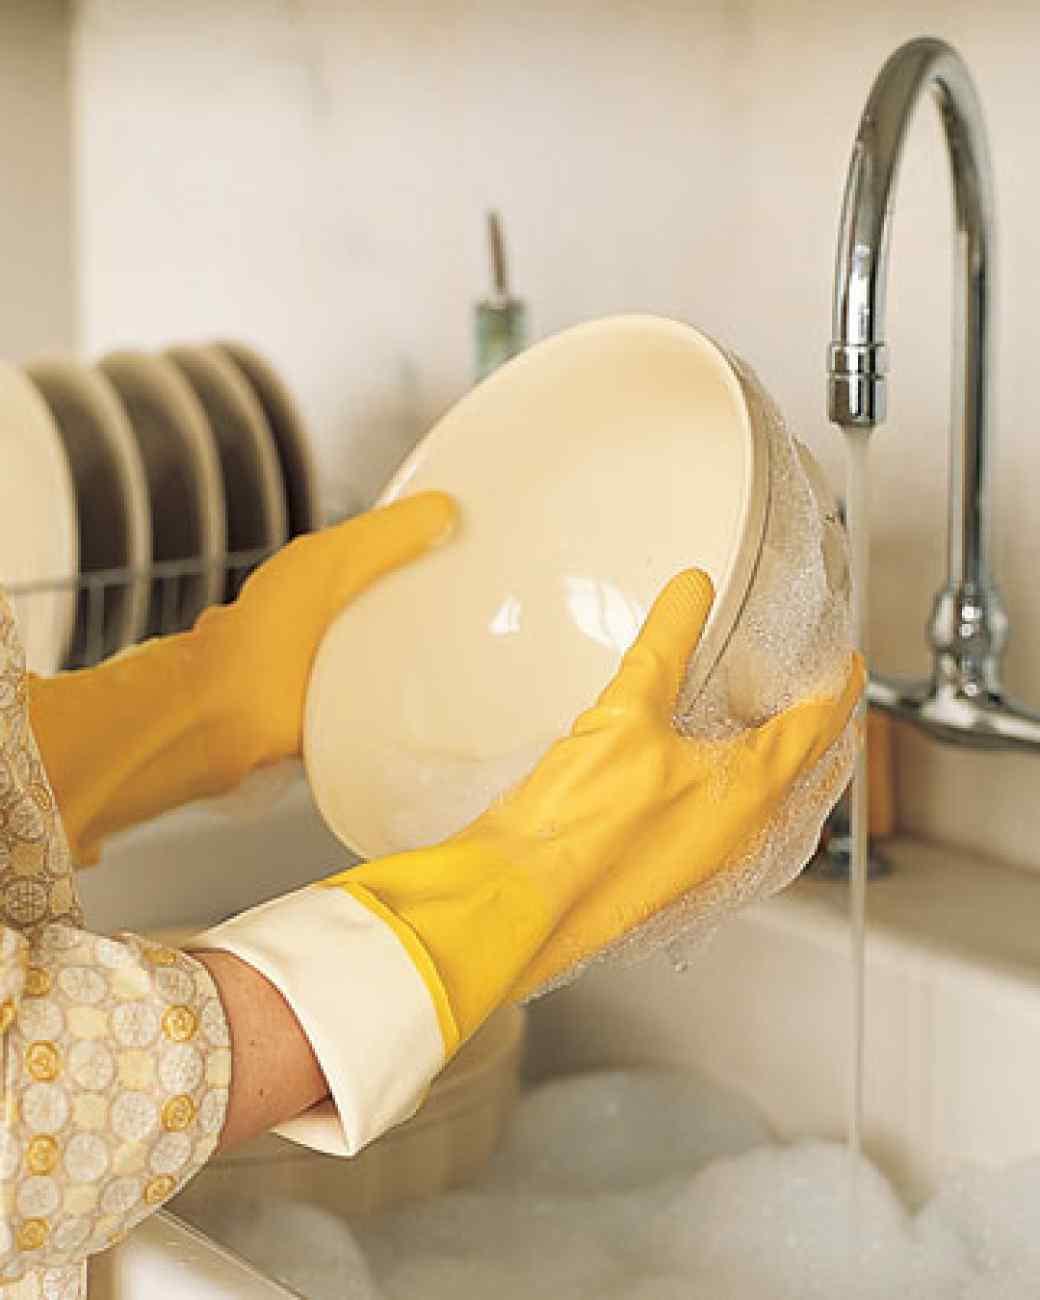 40 hacks to make washing dishes easier list inspired - Dish washing tips ...